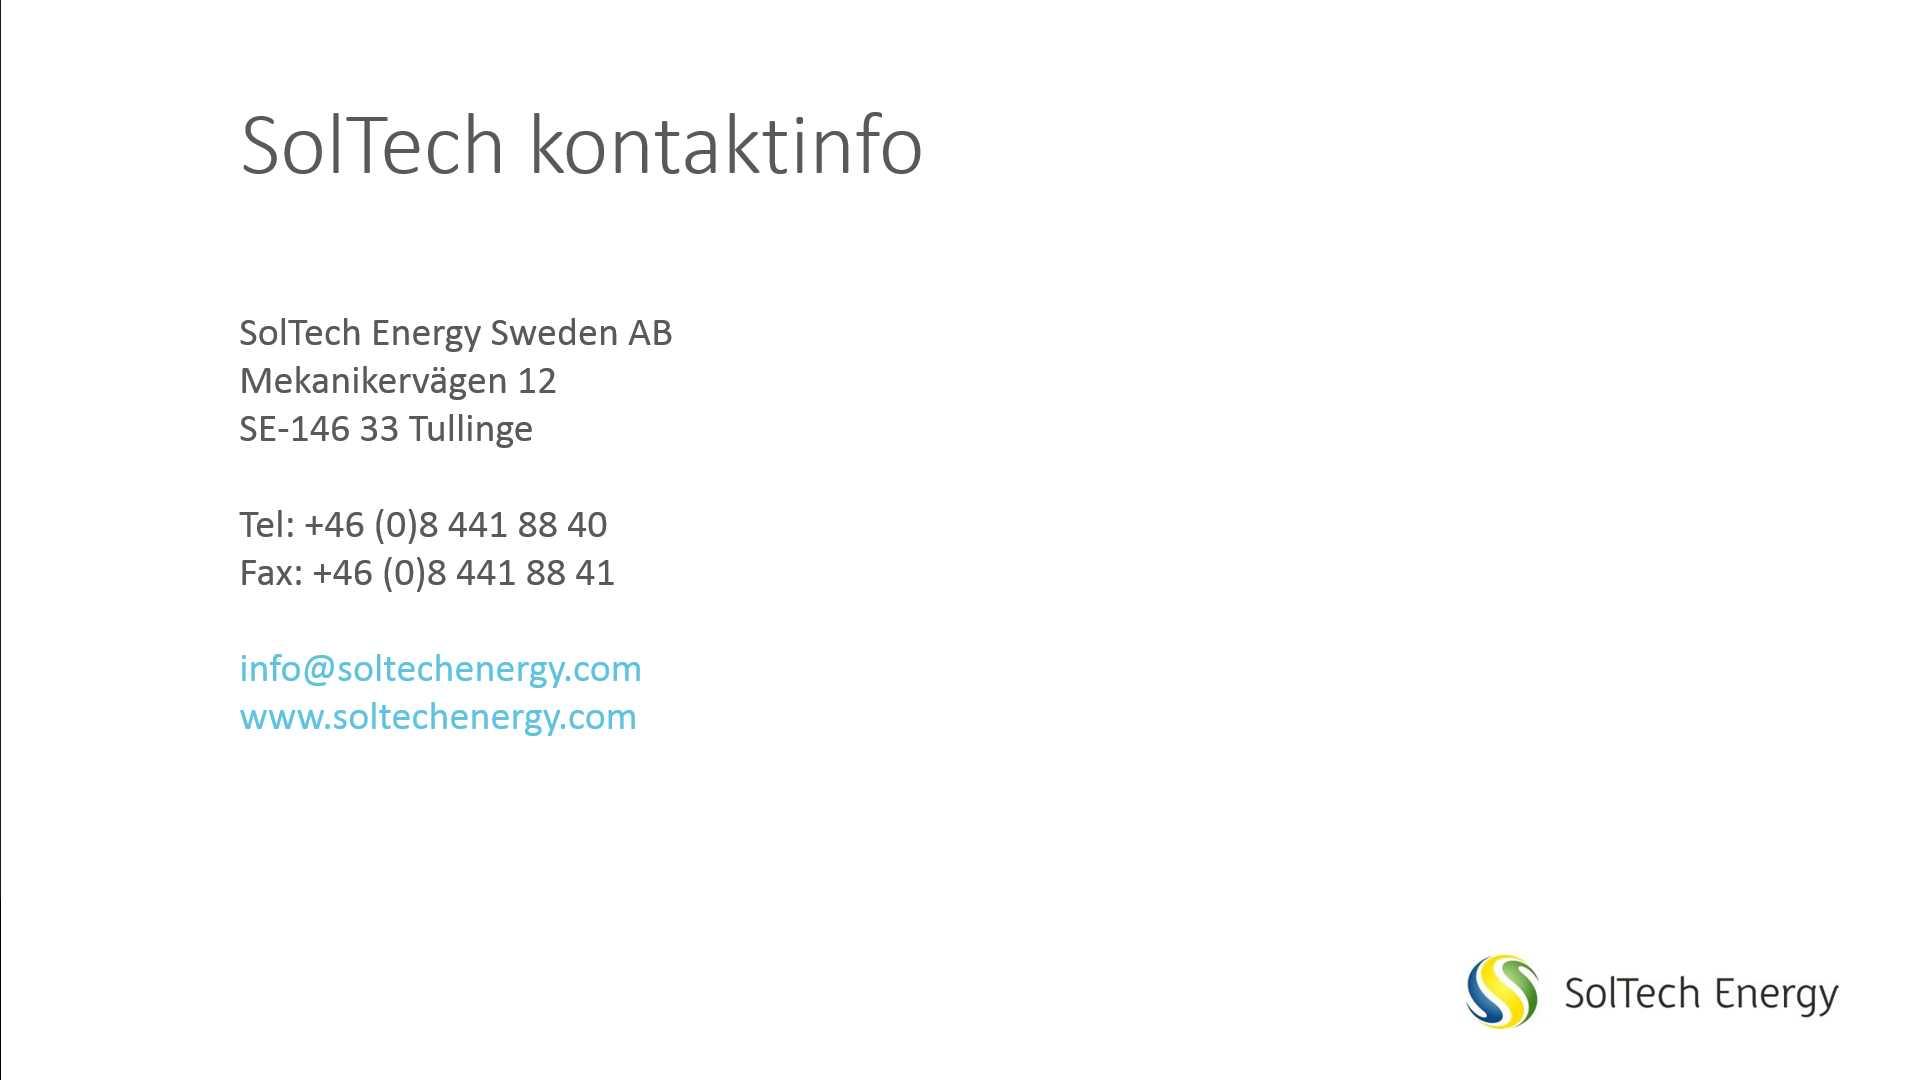 Soltech Energy Sweden